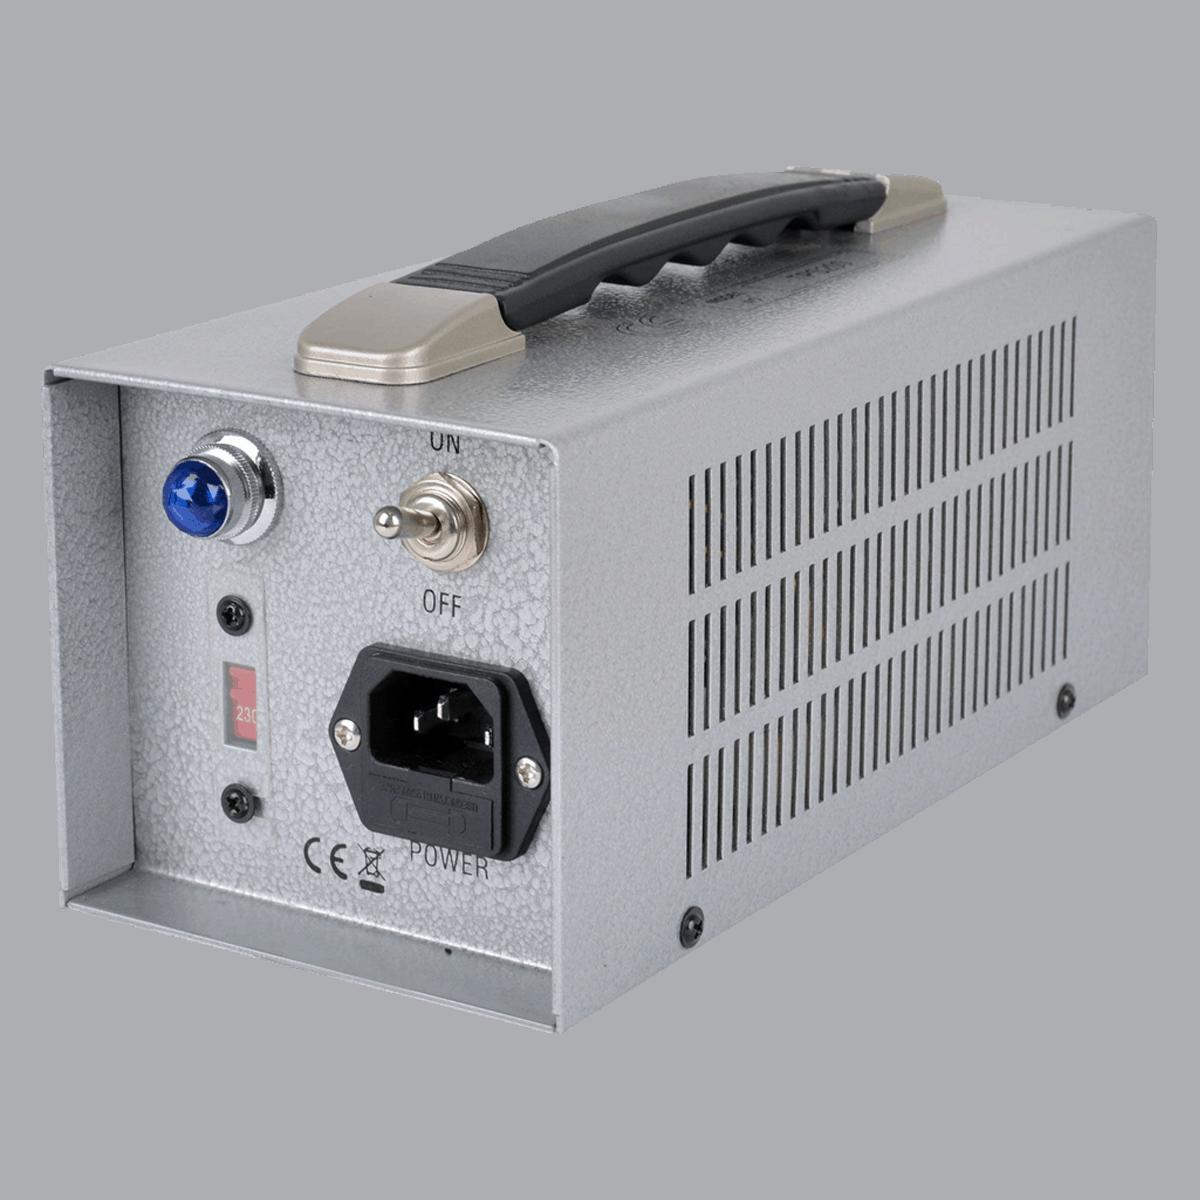 MK47 ScaleNordic Distributor of Pro Audio equipment